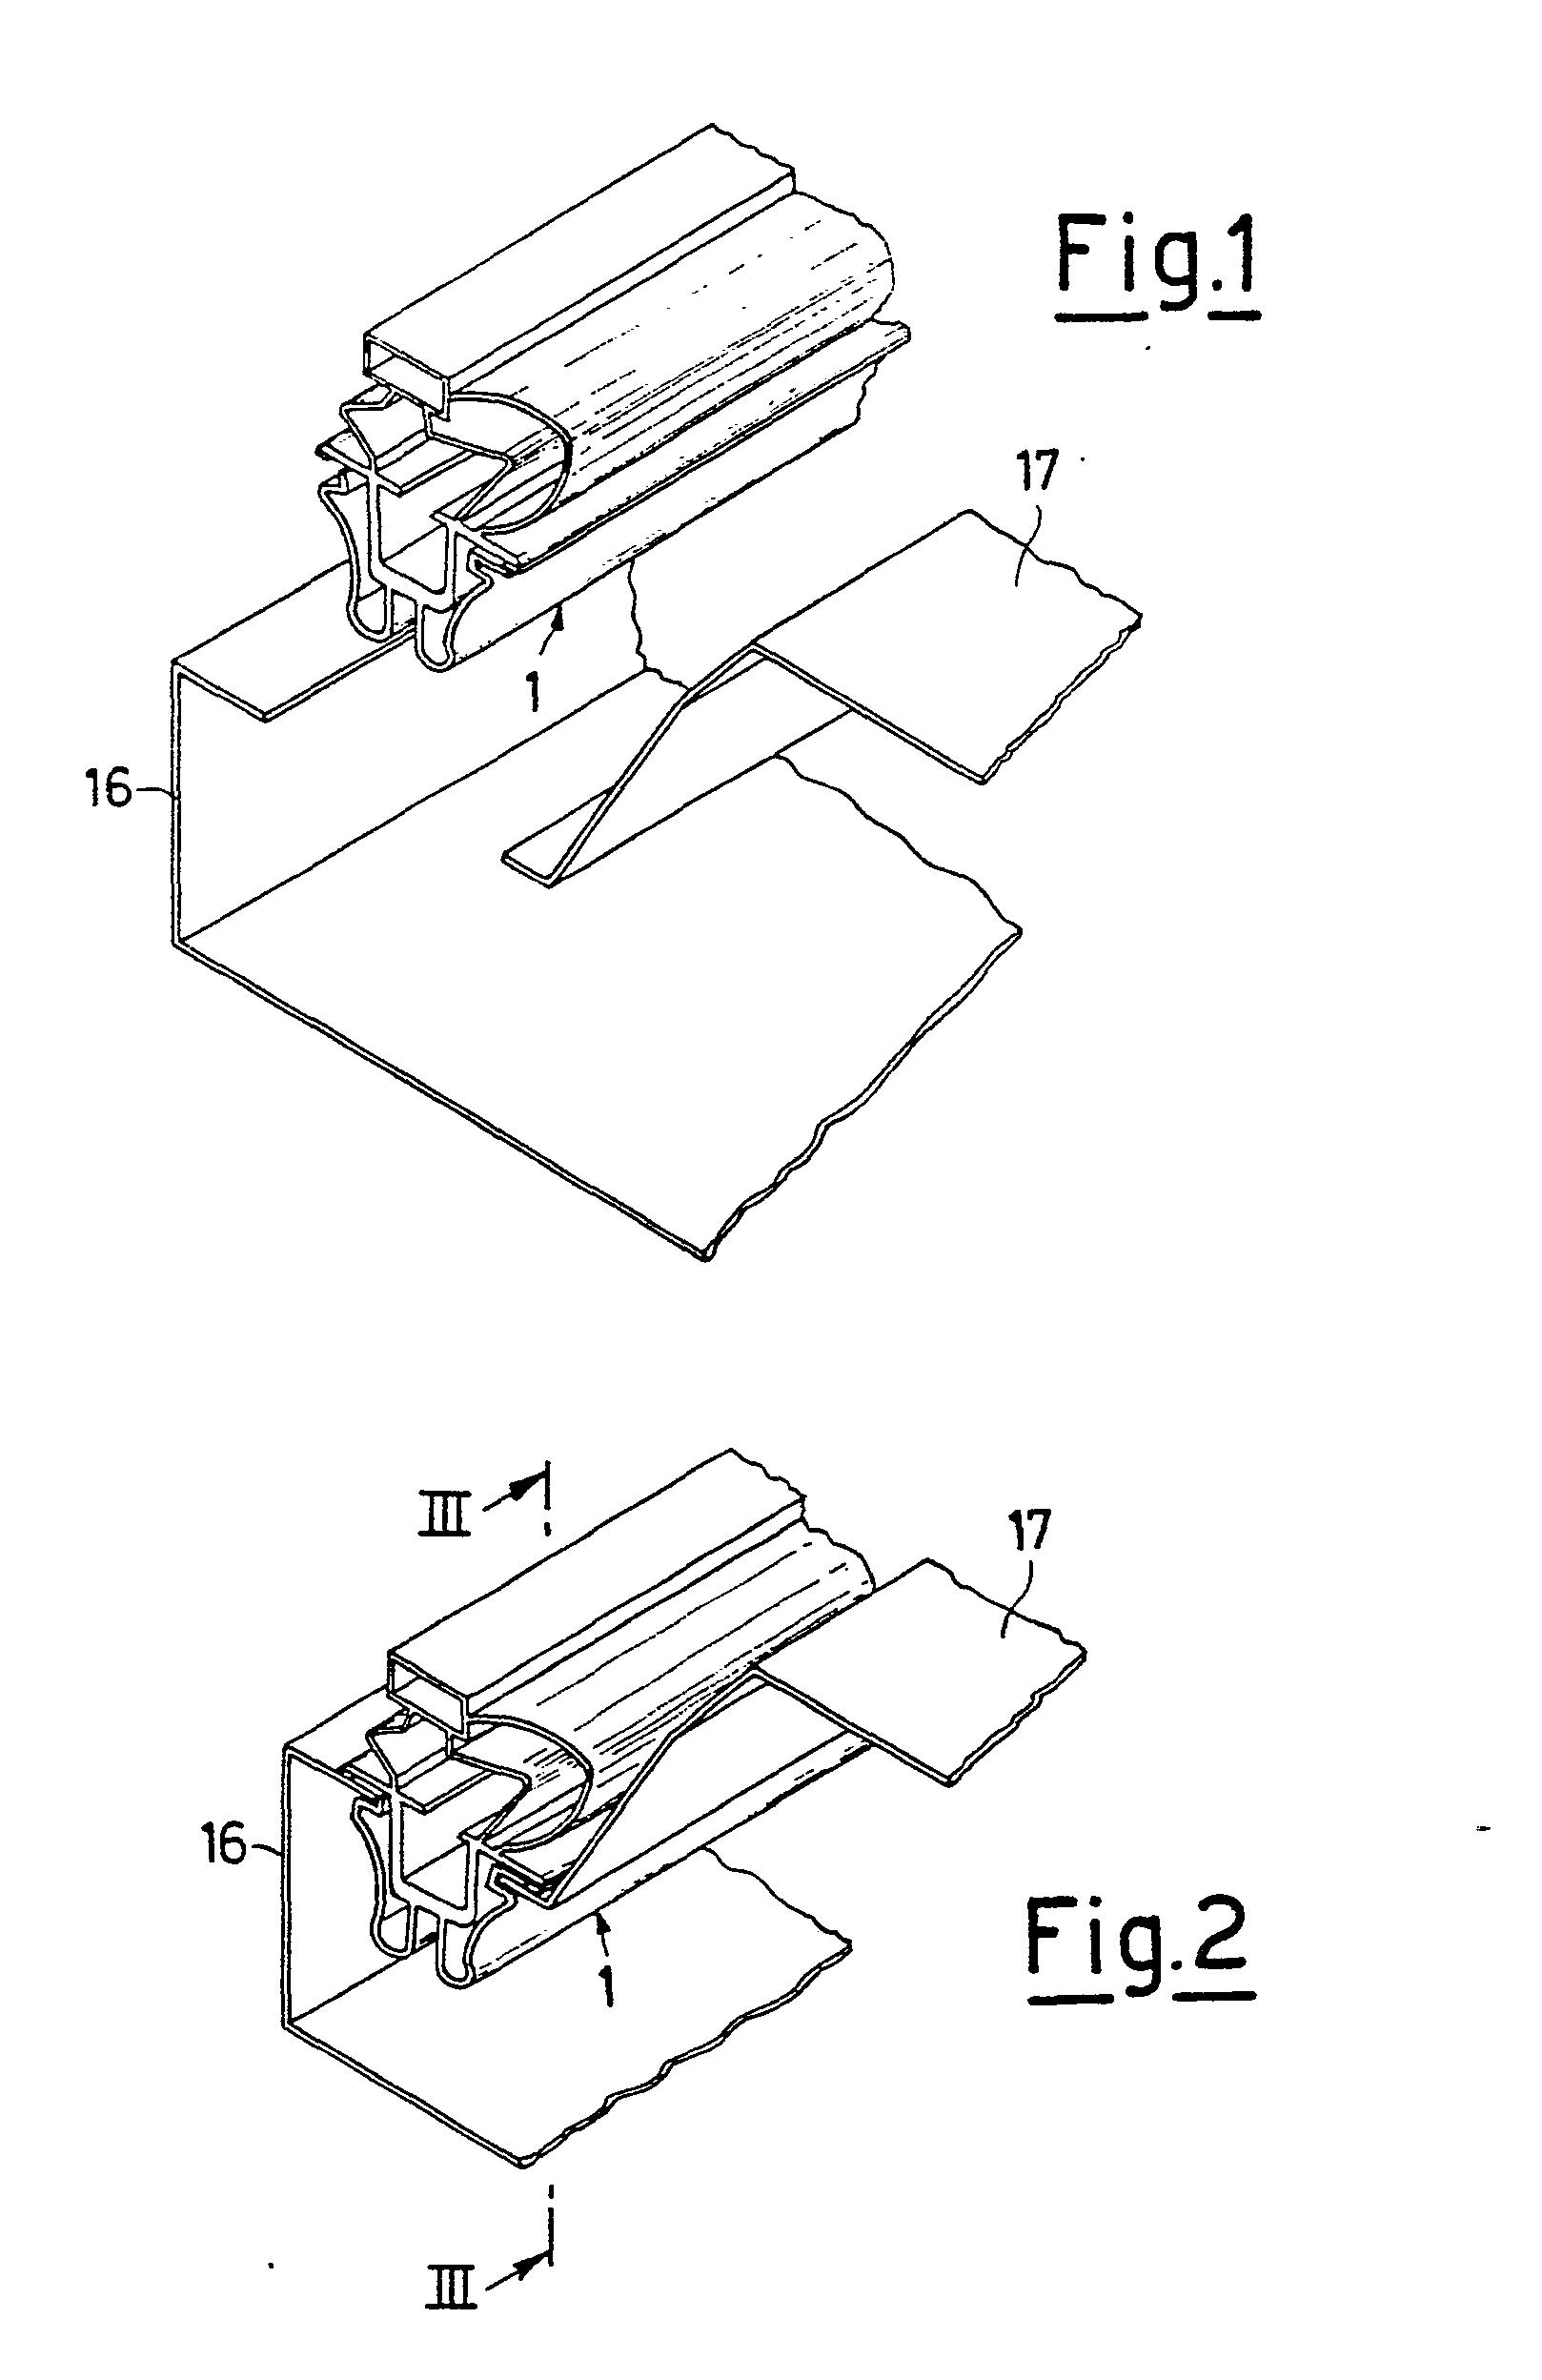 Wiring Diagram Furthermore Refrigerators Parts Maytag Refrigerator